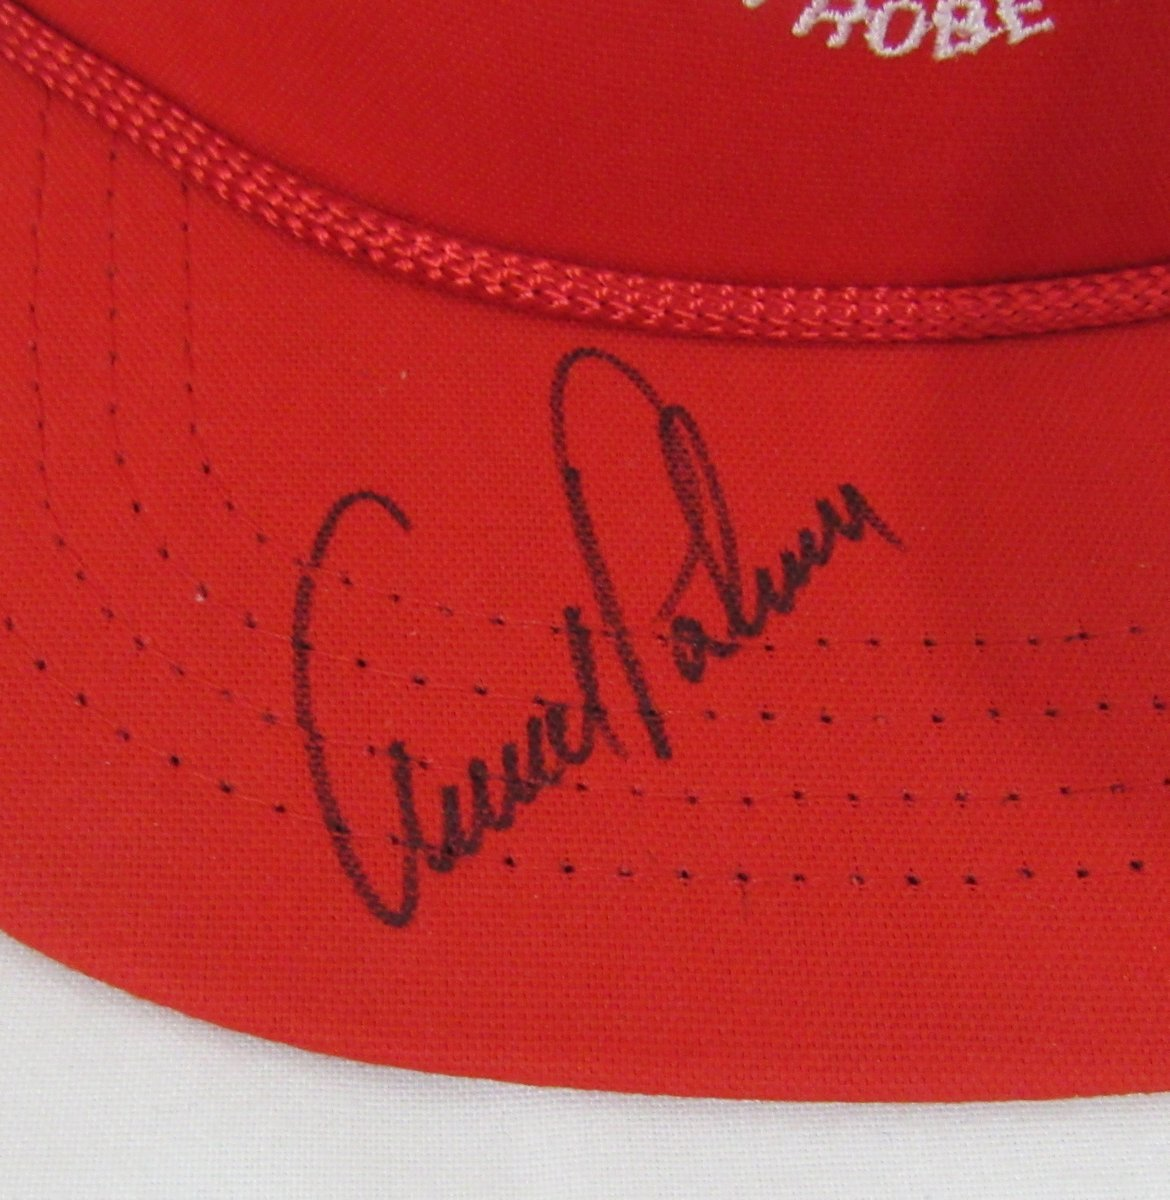 Arnold Palmer Autographed/Signed Latrobe County Club Hat JSA 136872